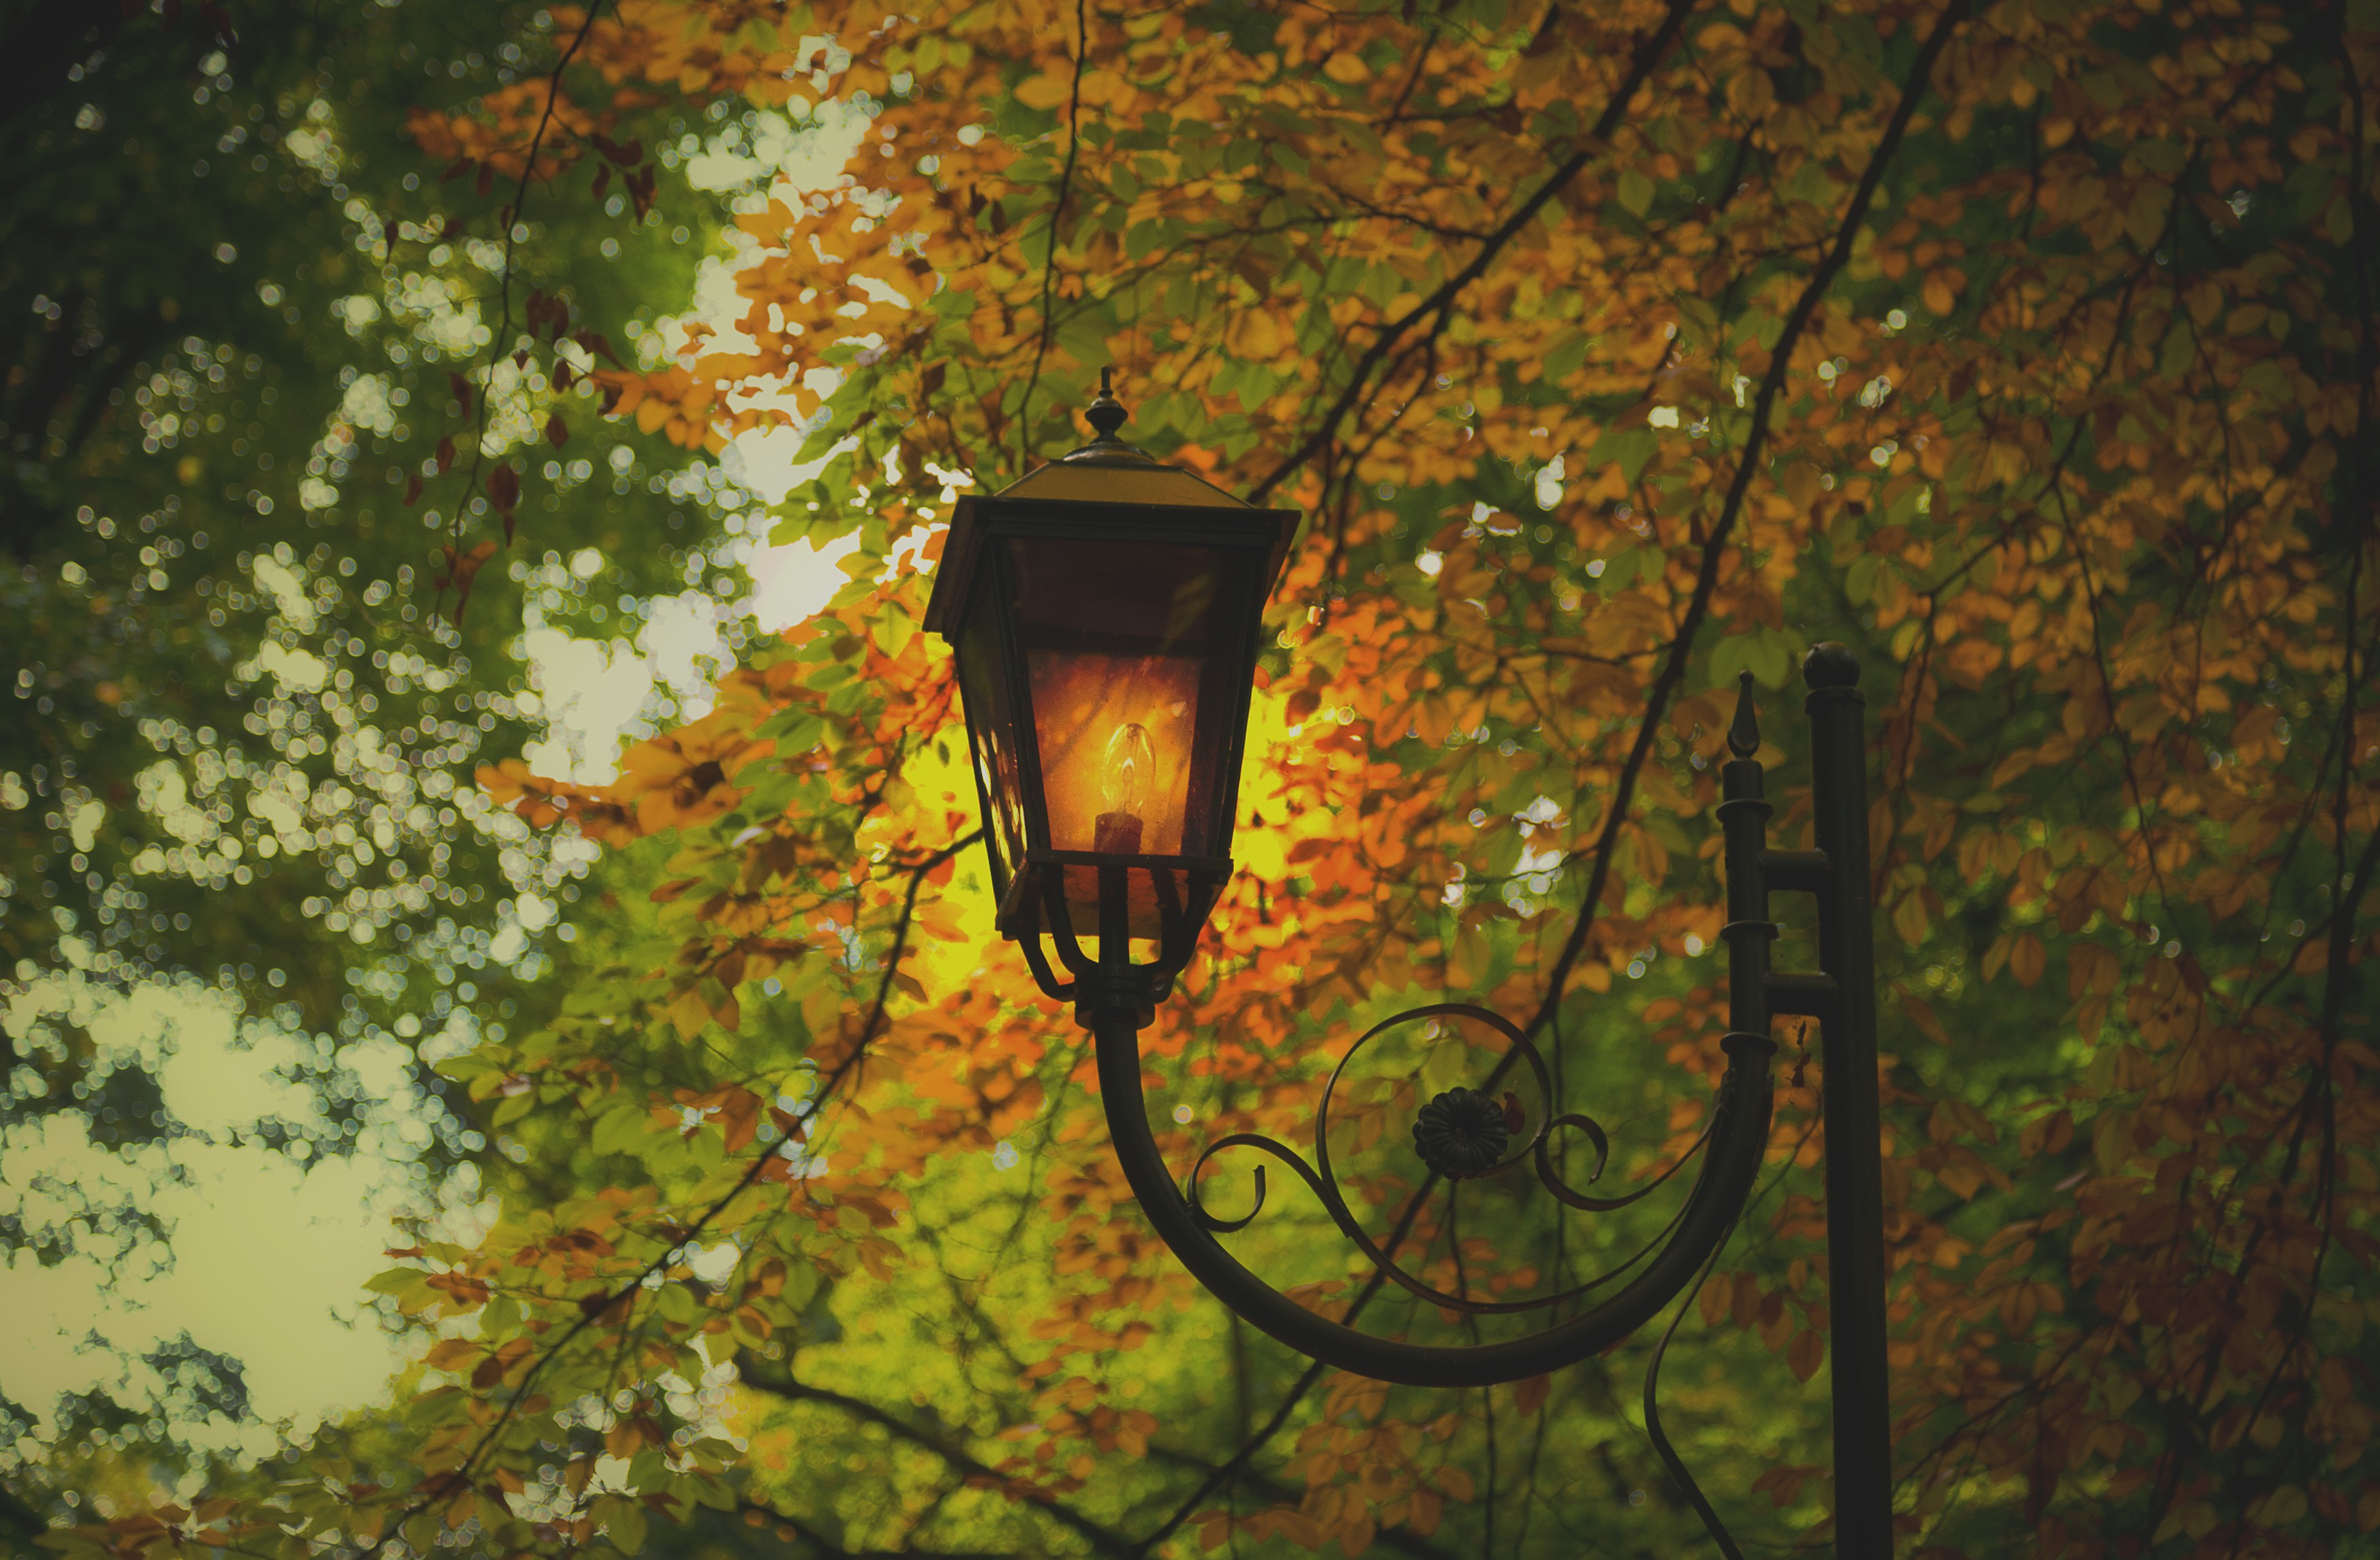 Misc: Lantern Autumn Park Trees Leaves Lamp Wallpaper for HD 16:9 ...